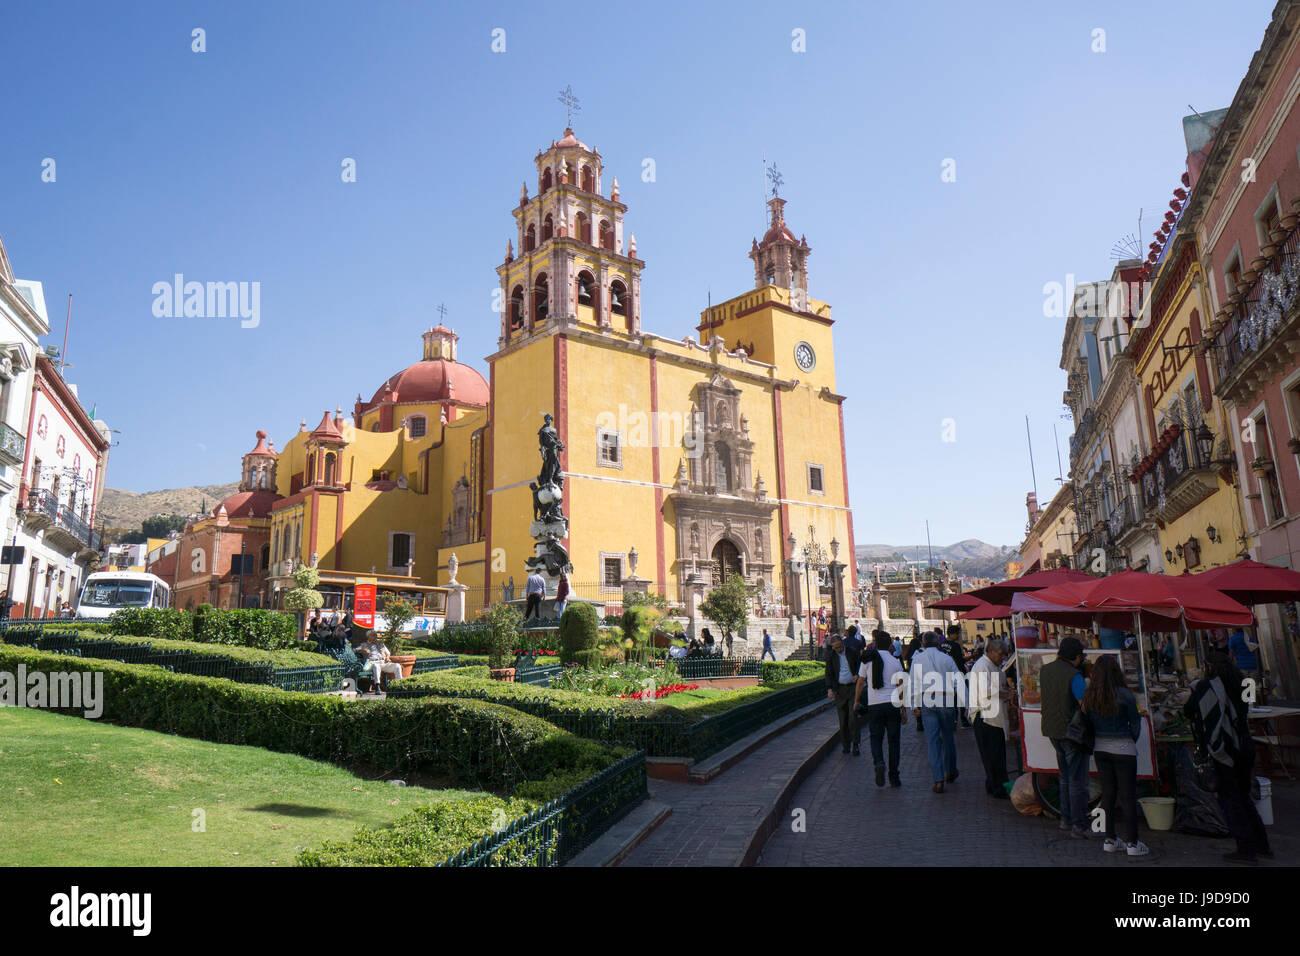 Basilica Colegiata de Nuestra Senora de Guanajuato, Guanajuato, UNESCO World Heritage Site, Mexico, North America - Stock Image